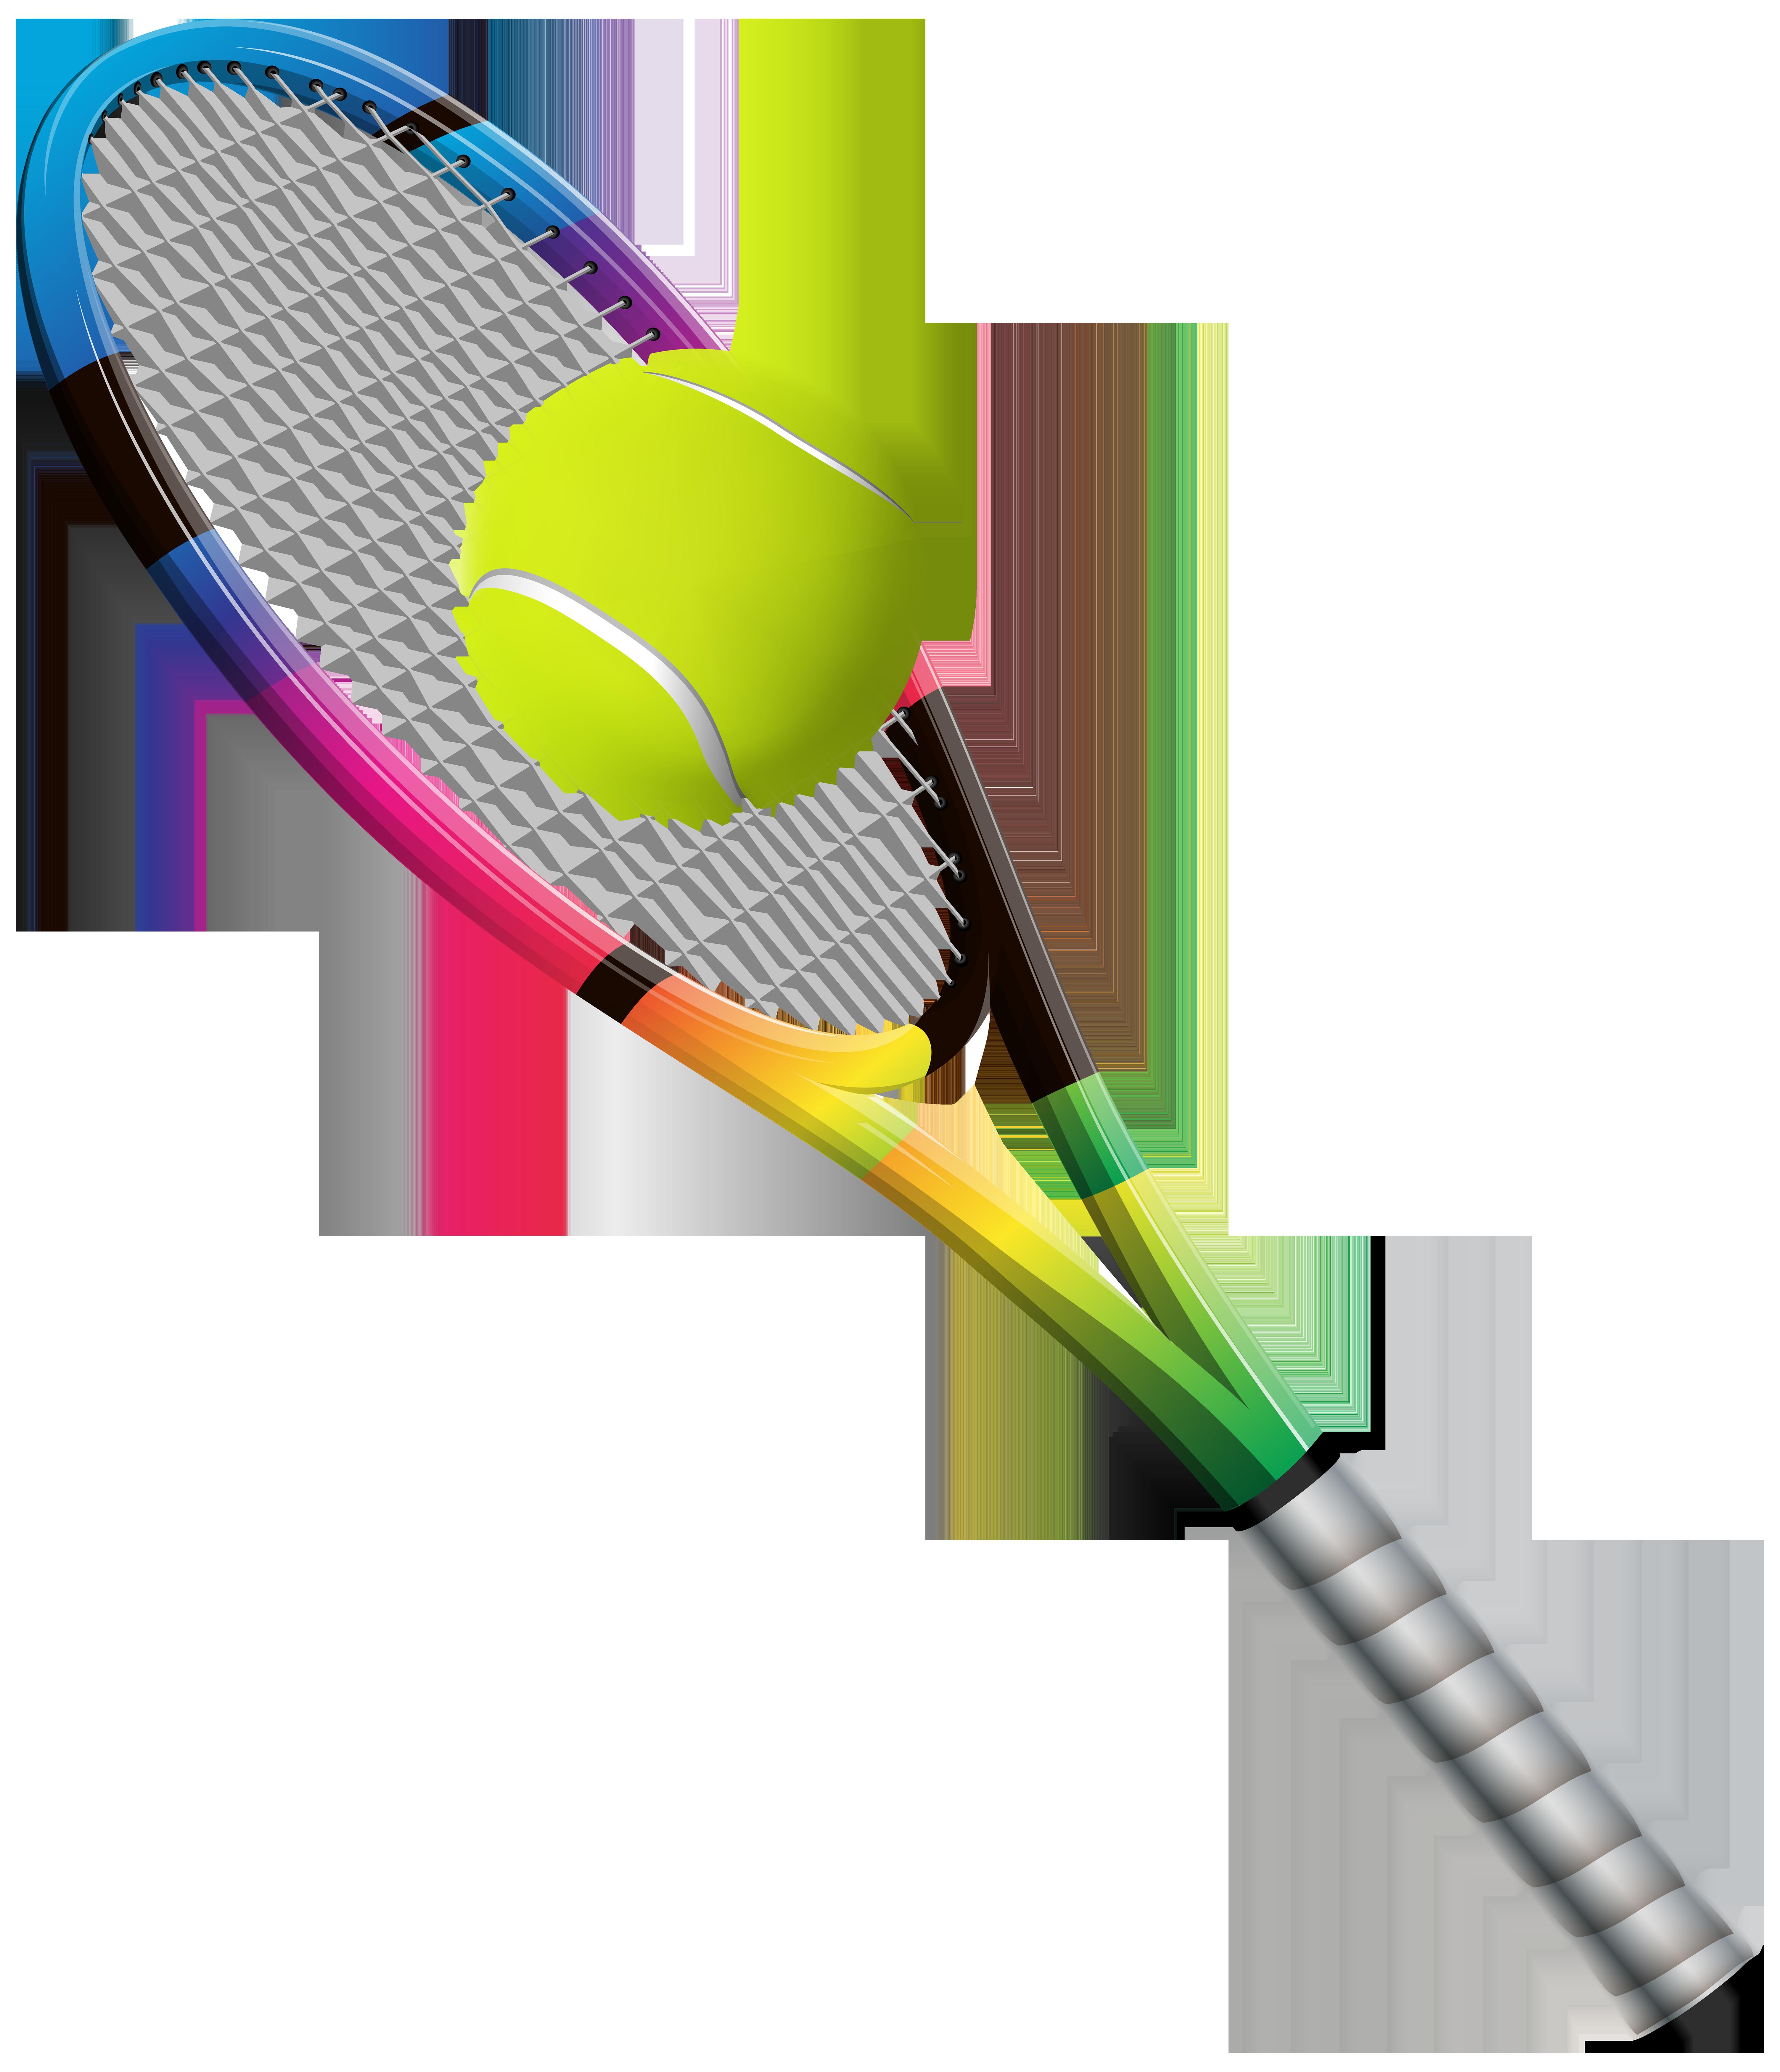 Baseball bat and tennis racket clipart jpg freeuse stock Tennis Racket And Ball Free Download Clip Art - carwad.net jpg freeuse stock